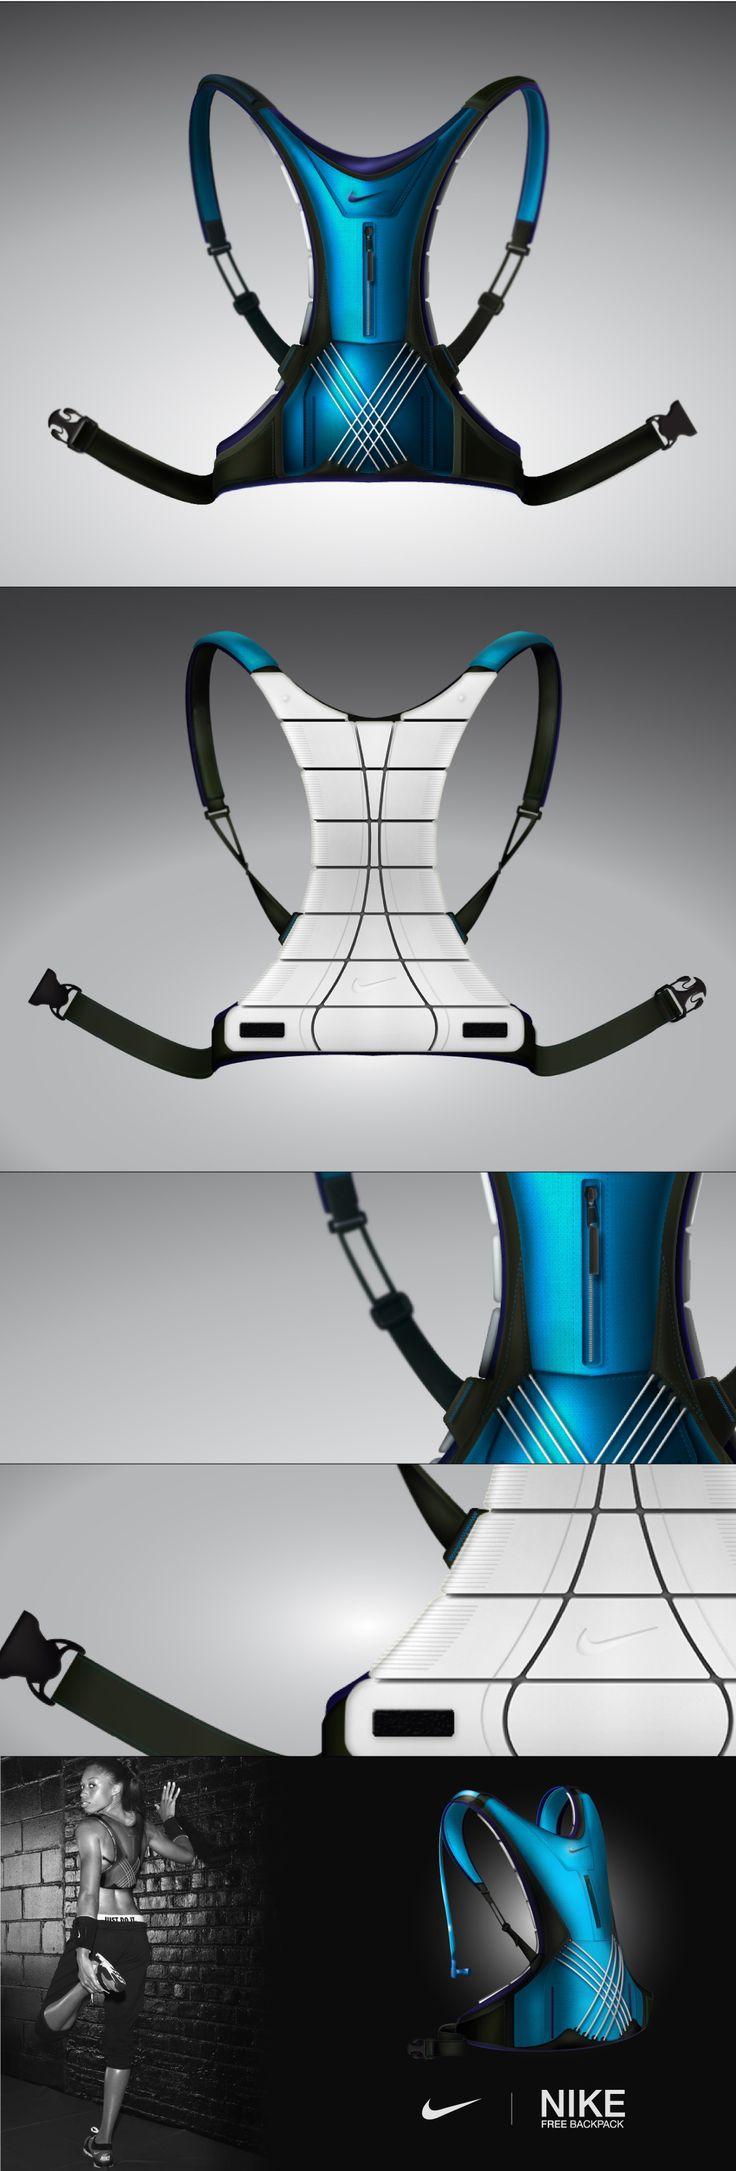 Nike Backpack | Valentin Dequidt